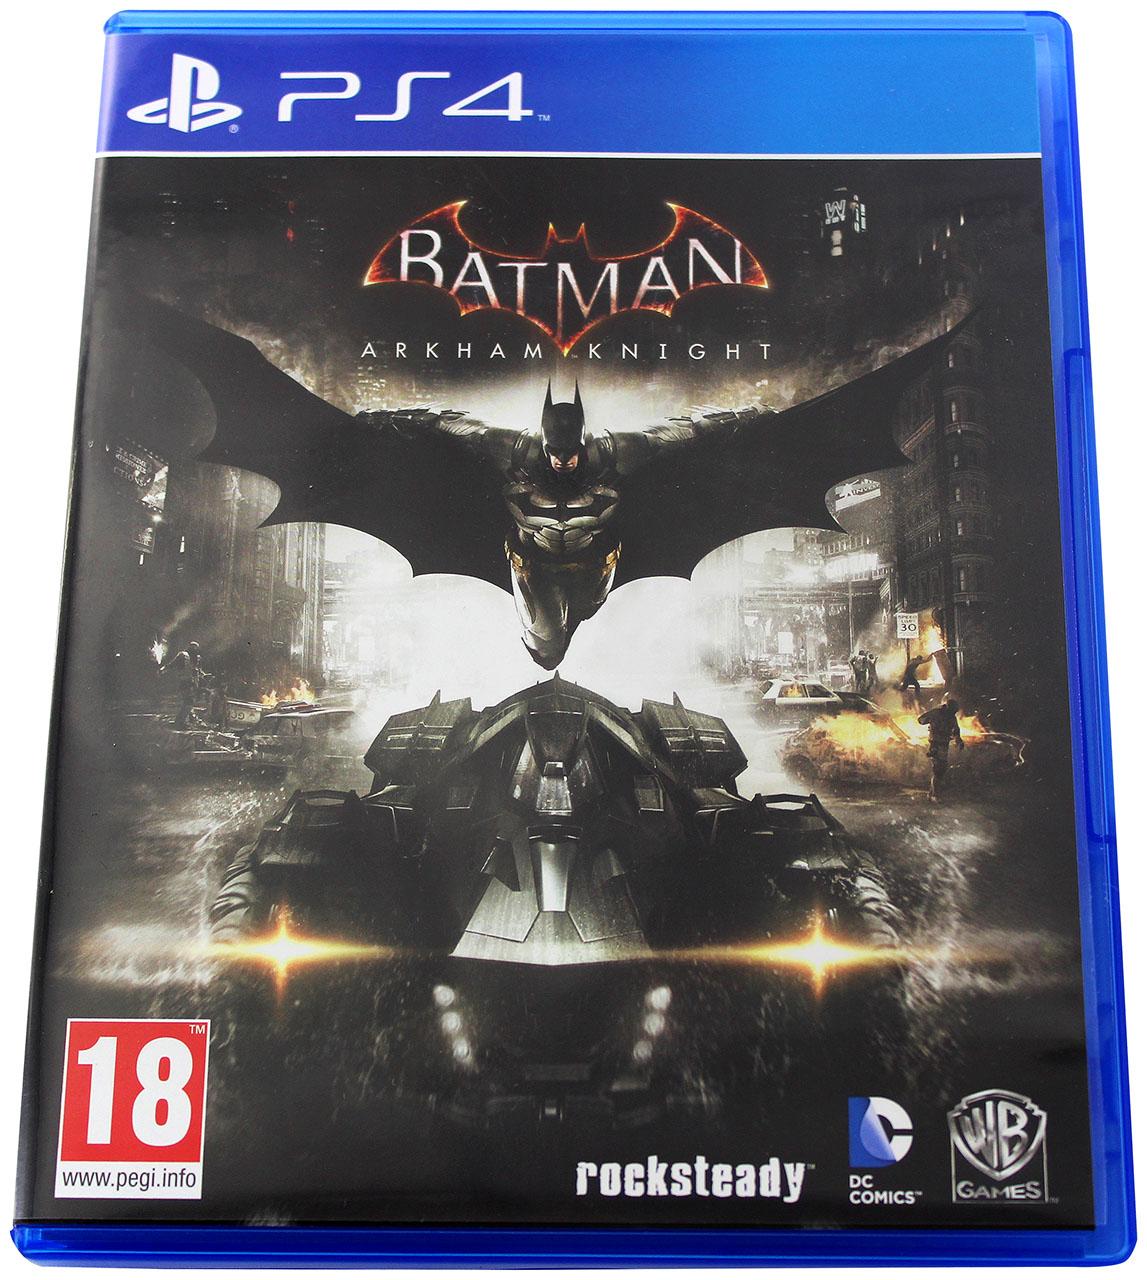 Batman: Arkham Knight (Playstation 4) [UK IMPORT]